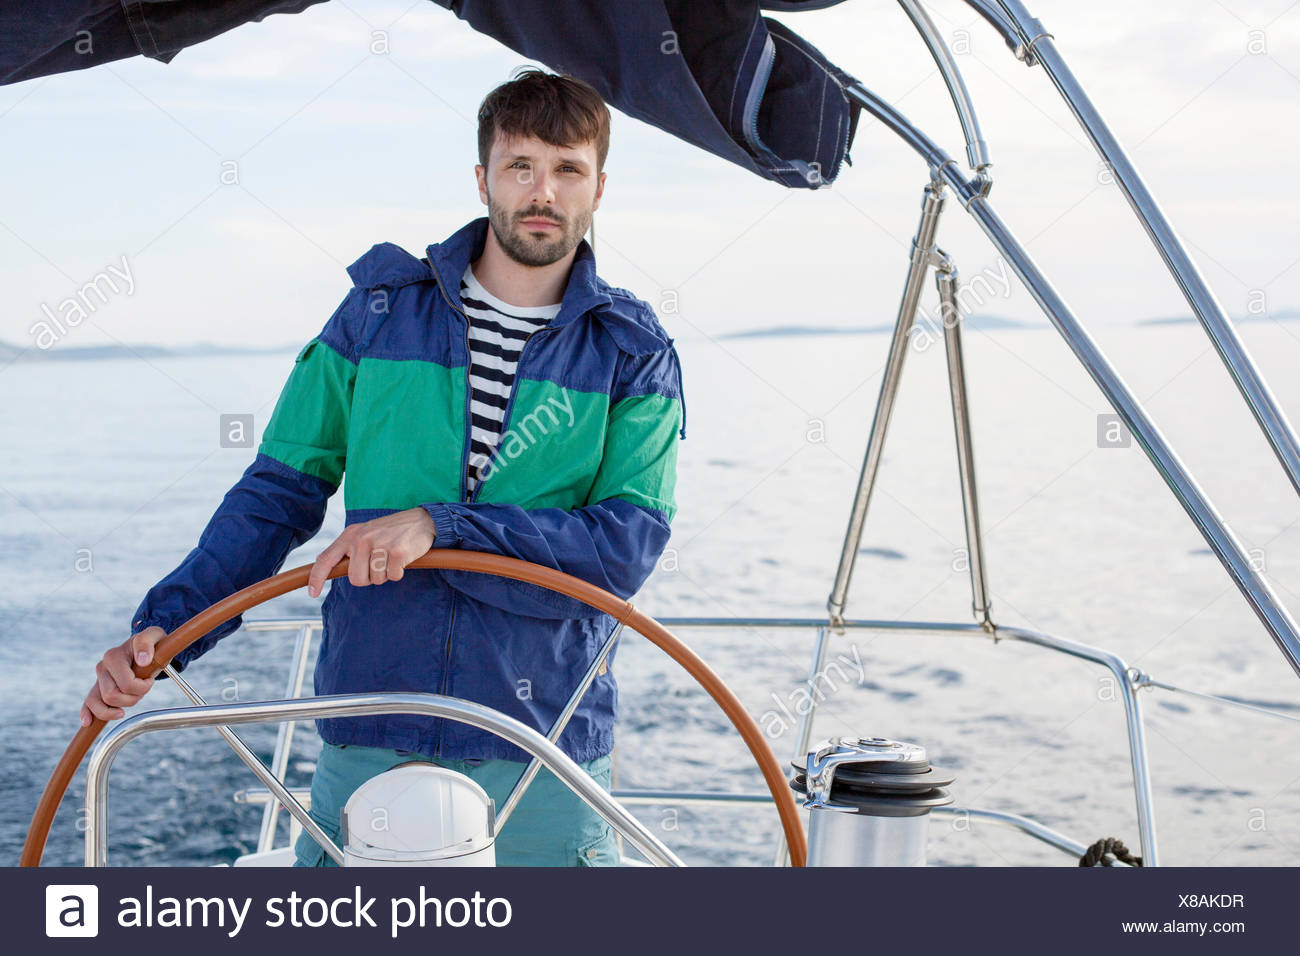 Man steering sailboat, Adriatic Sea - Stock Image